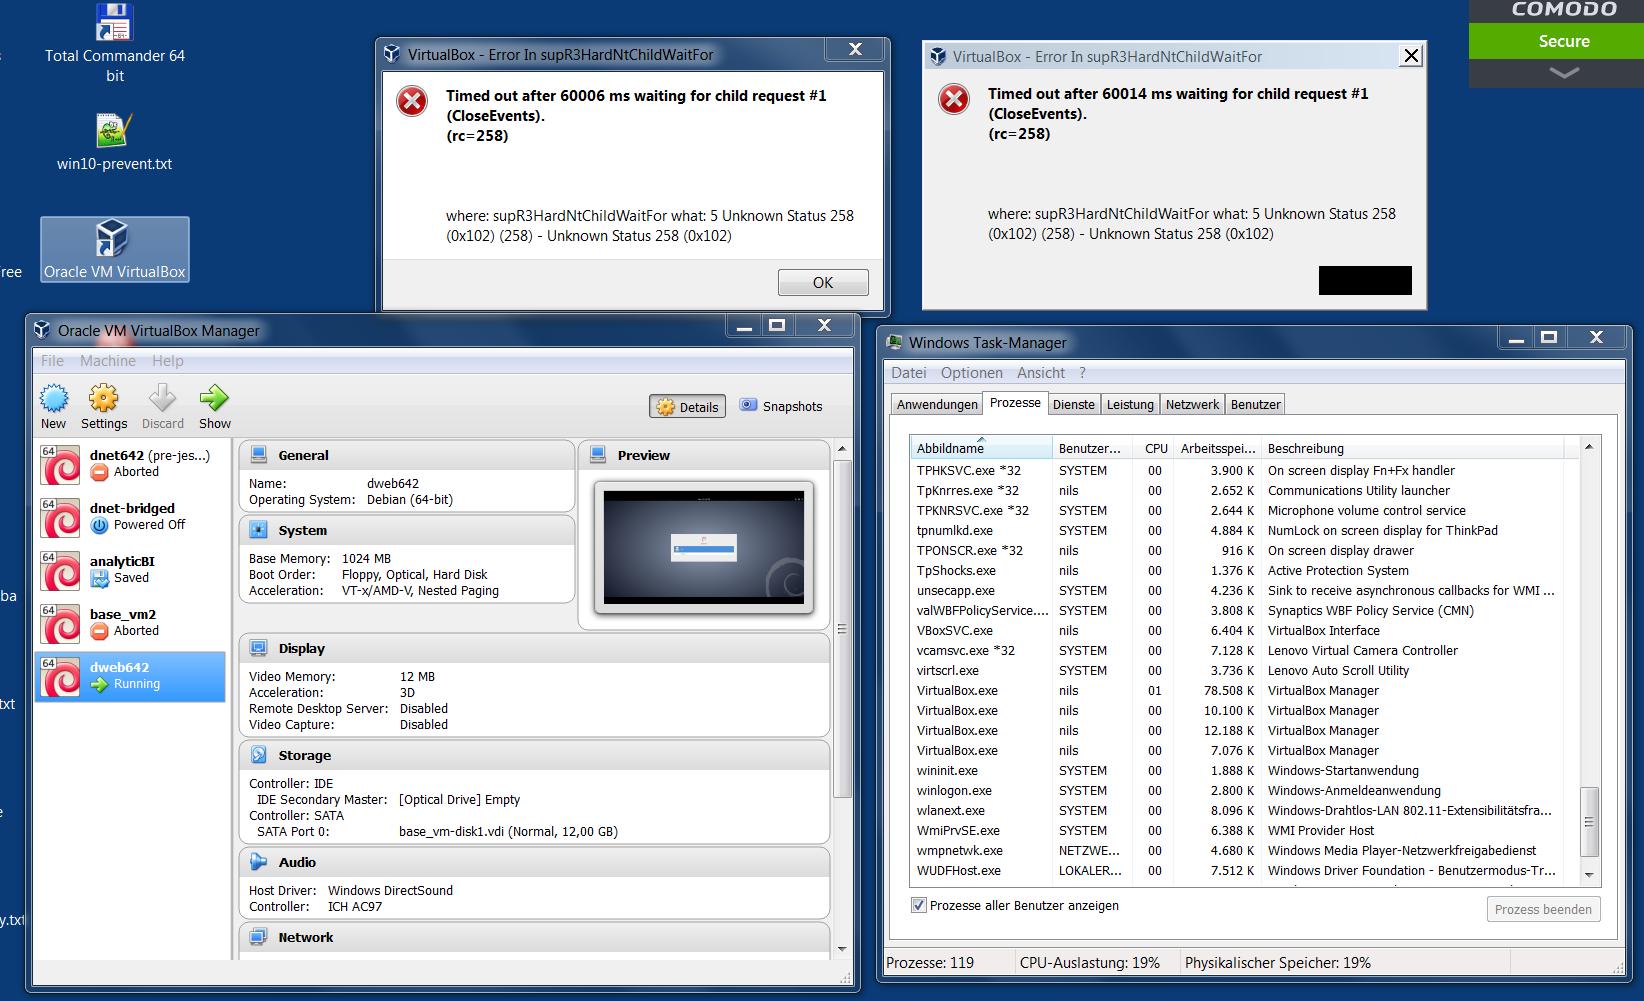 virtualbox 5.0.10